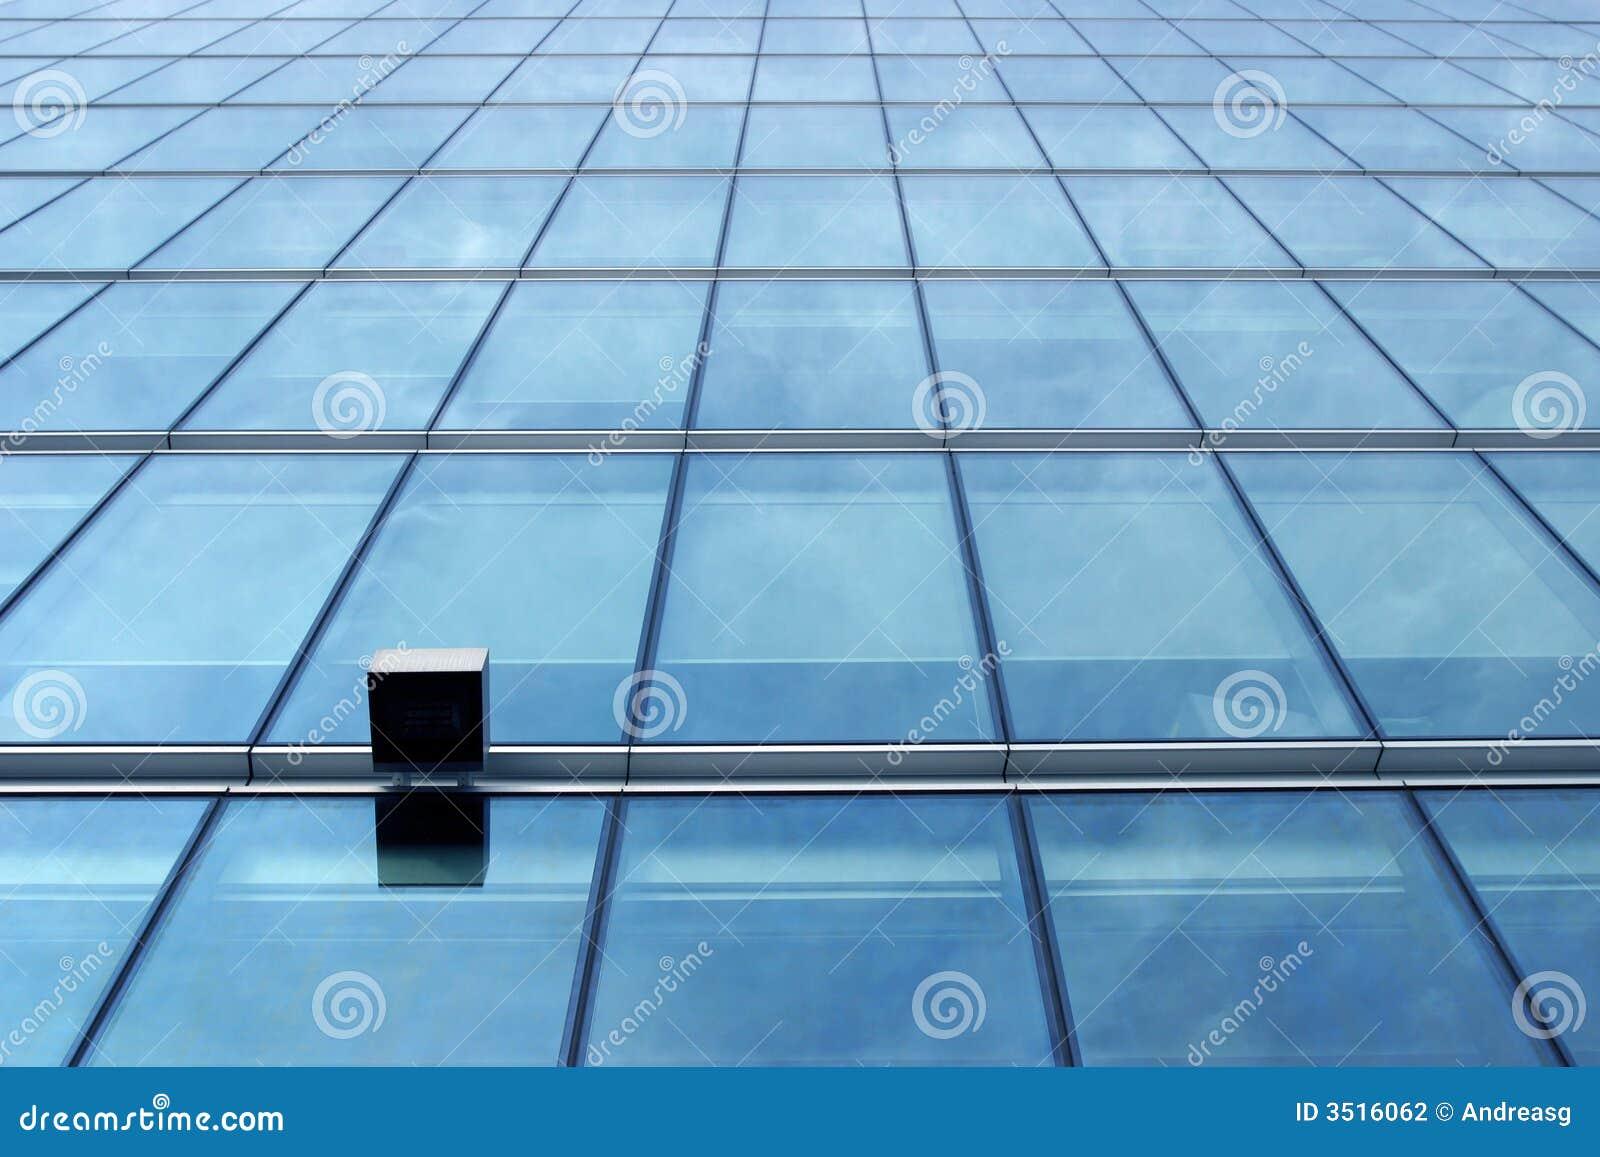 Blue glass wall